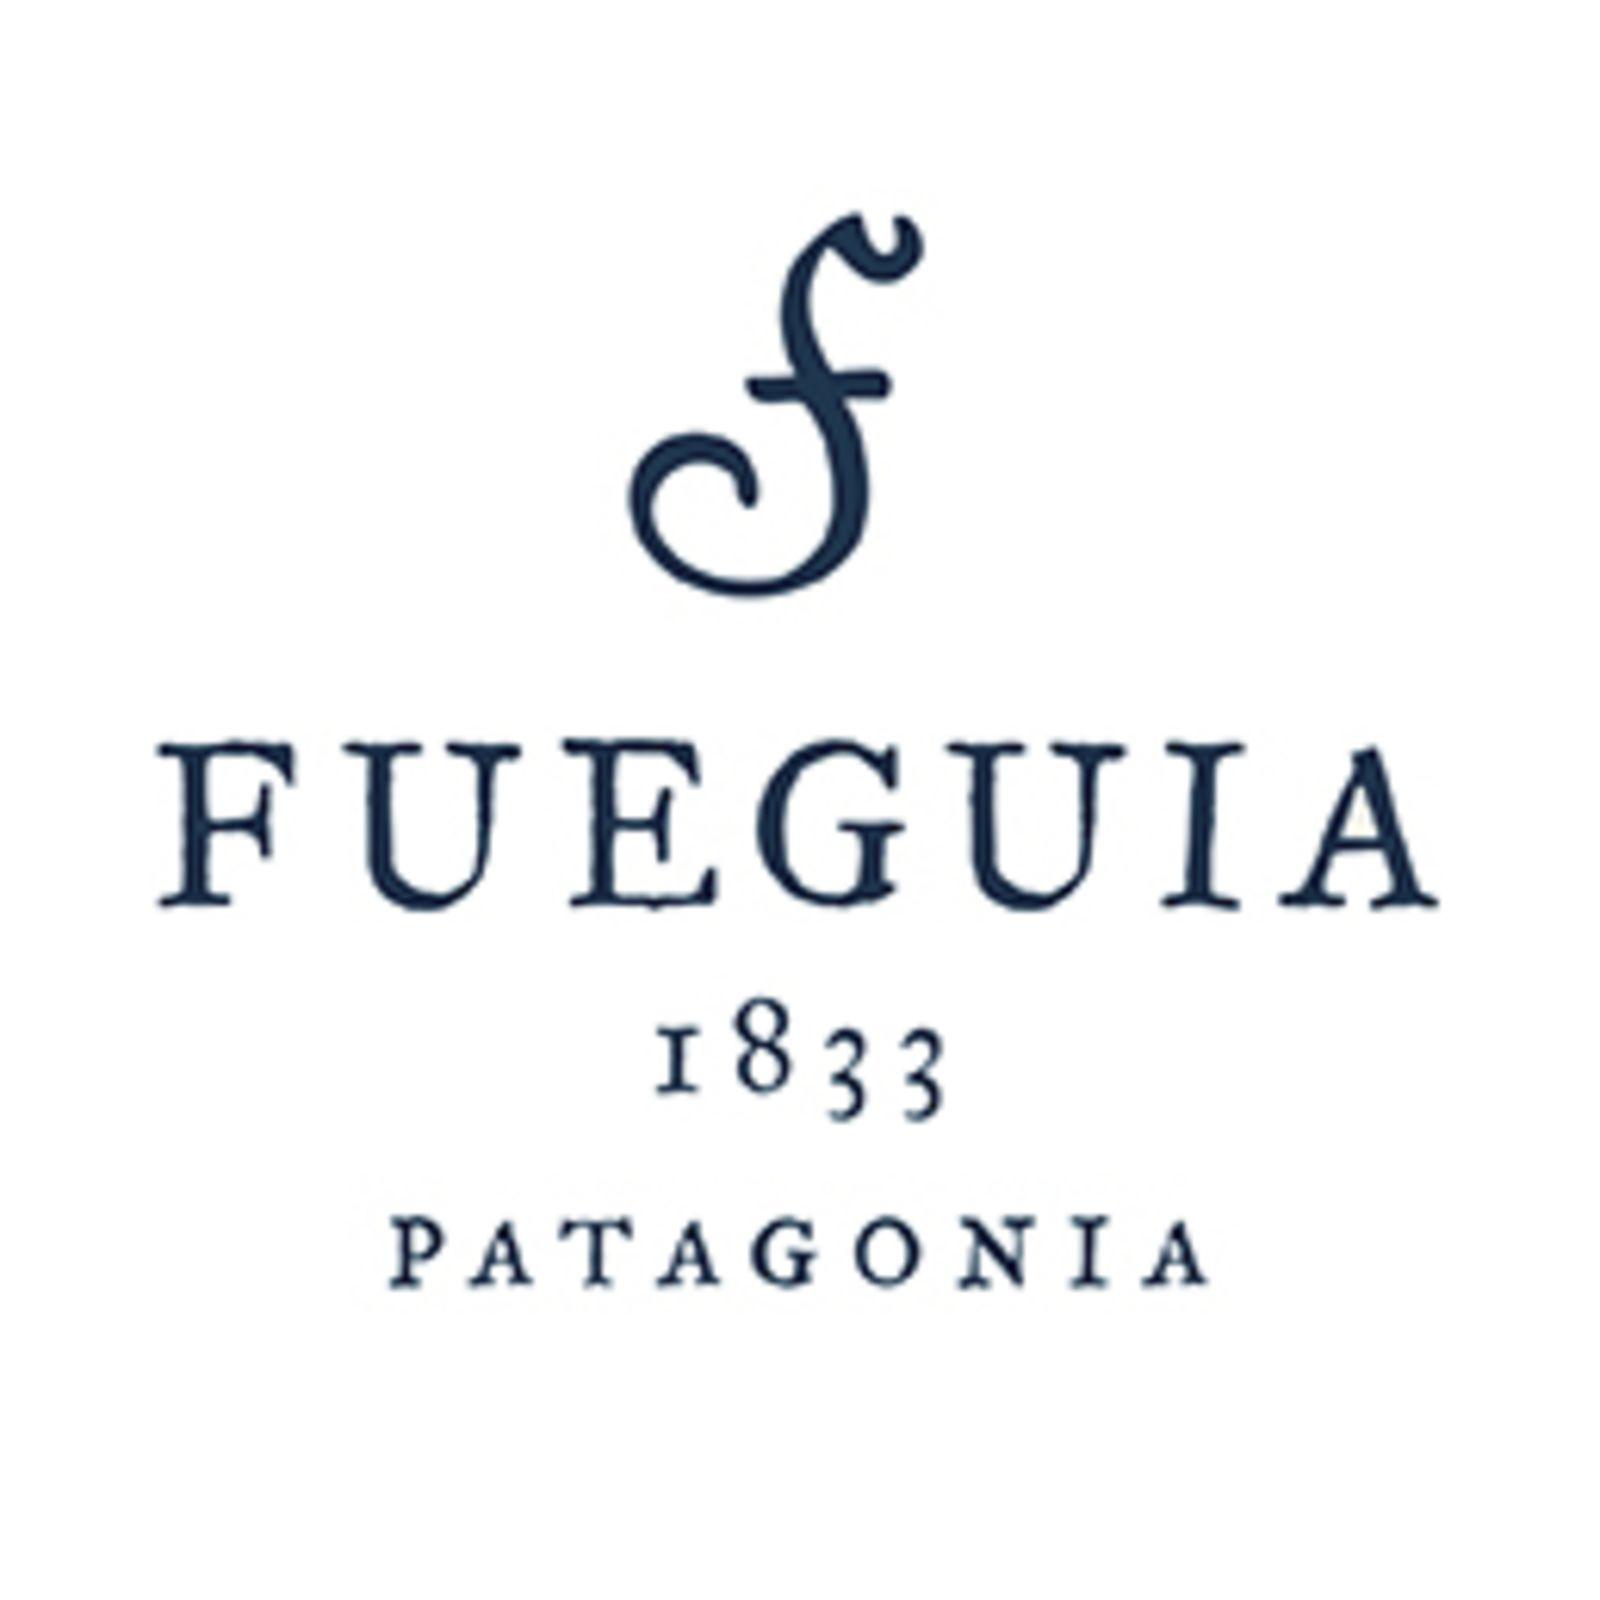 FUEGUIA 1833